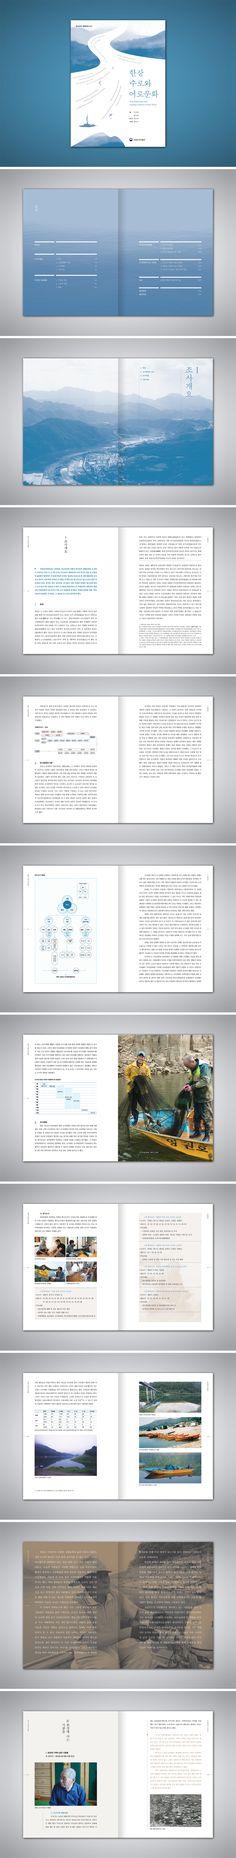 Client. National Folk Museum of Korea / Designer. Sym Phony #디자인 #편집디자인 #편집 #사보 #국립민속박물관 #보고서 #삼십칠도커뮤니케이션 #37도커뮤니케이션 Print Layout, Layout Design, Editorial Design, Catalogue Layout, Picture Albums, Magazine Design, Korea, Book Design, Museum